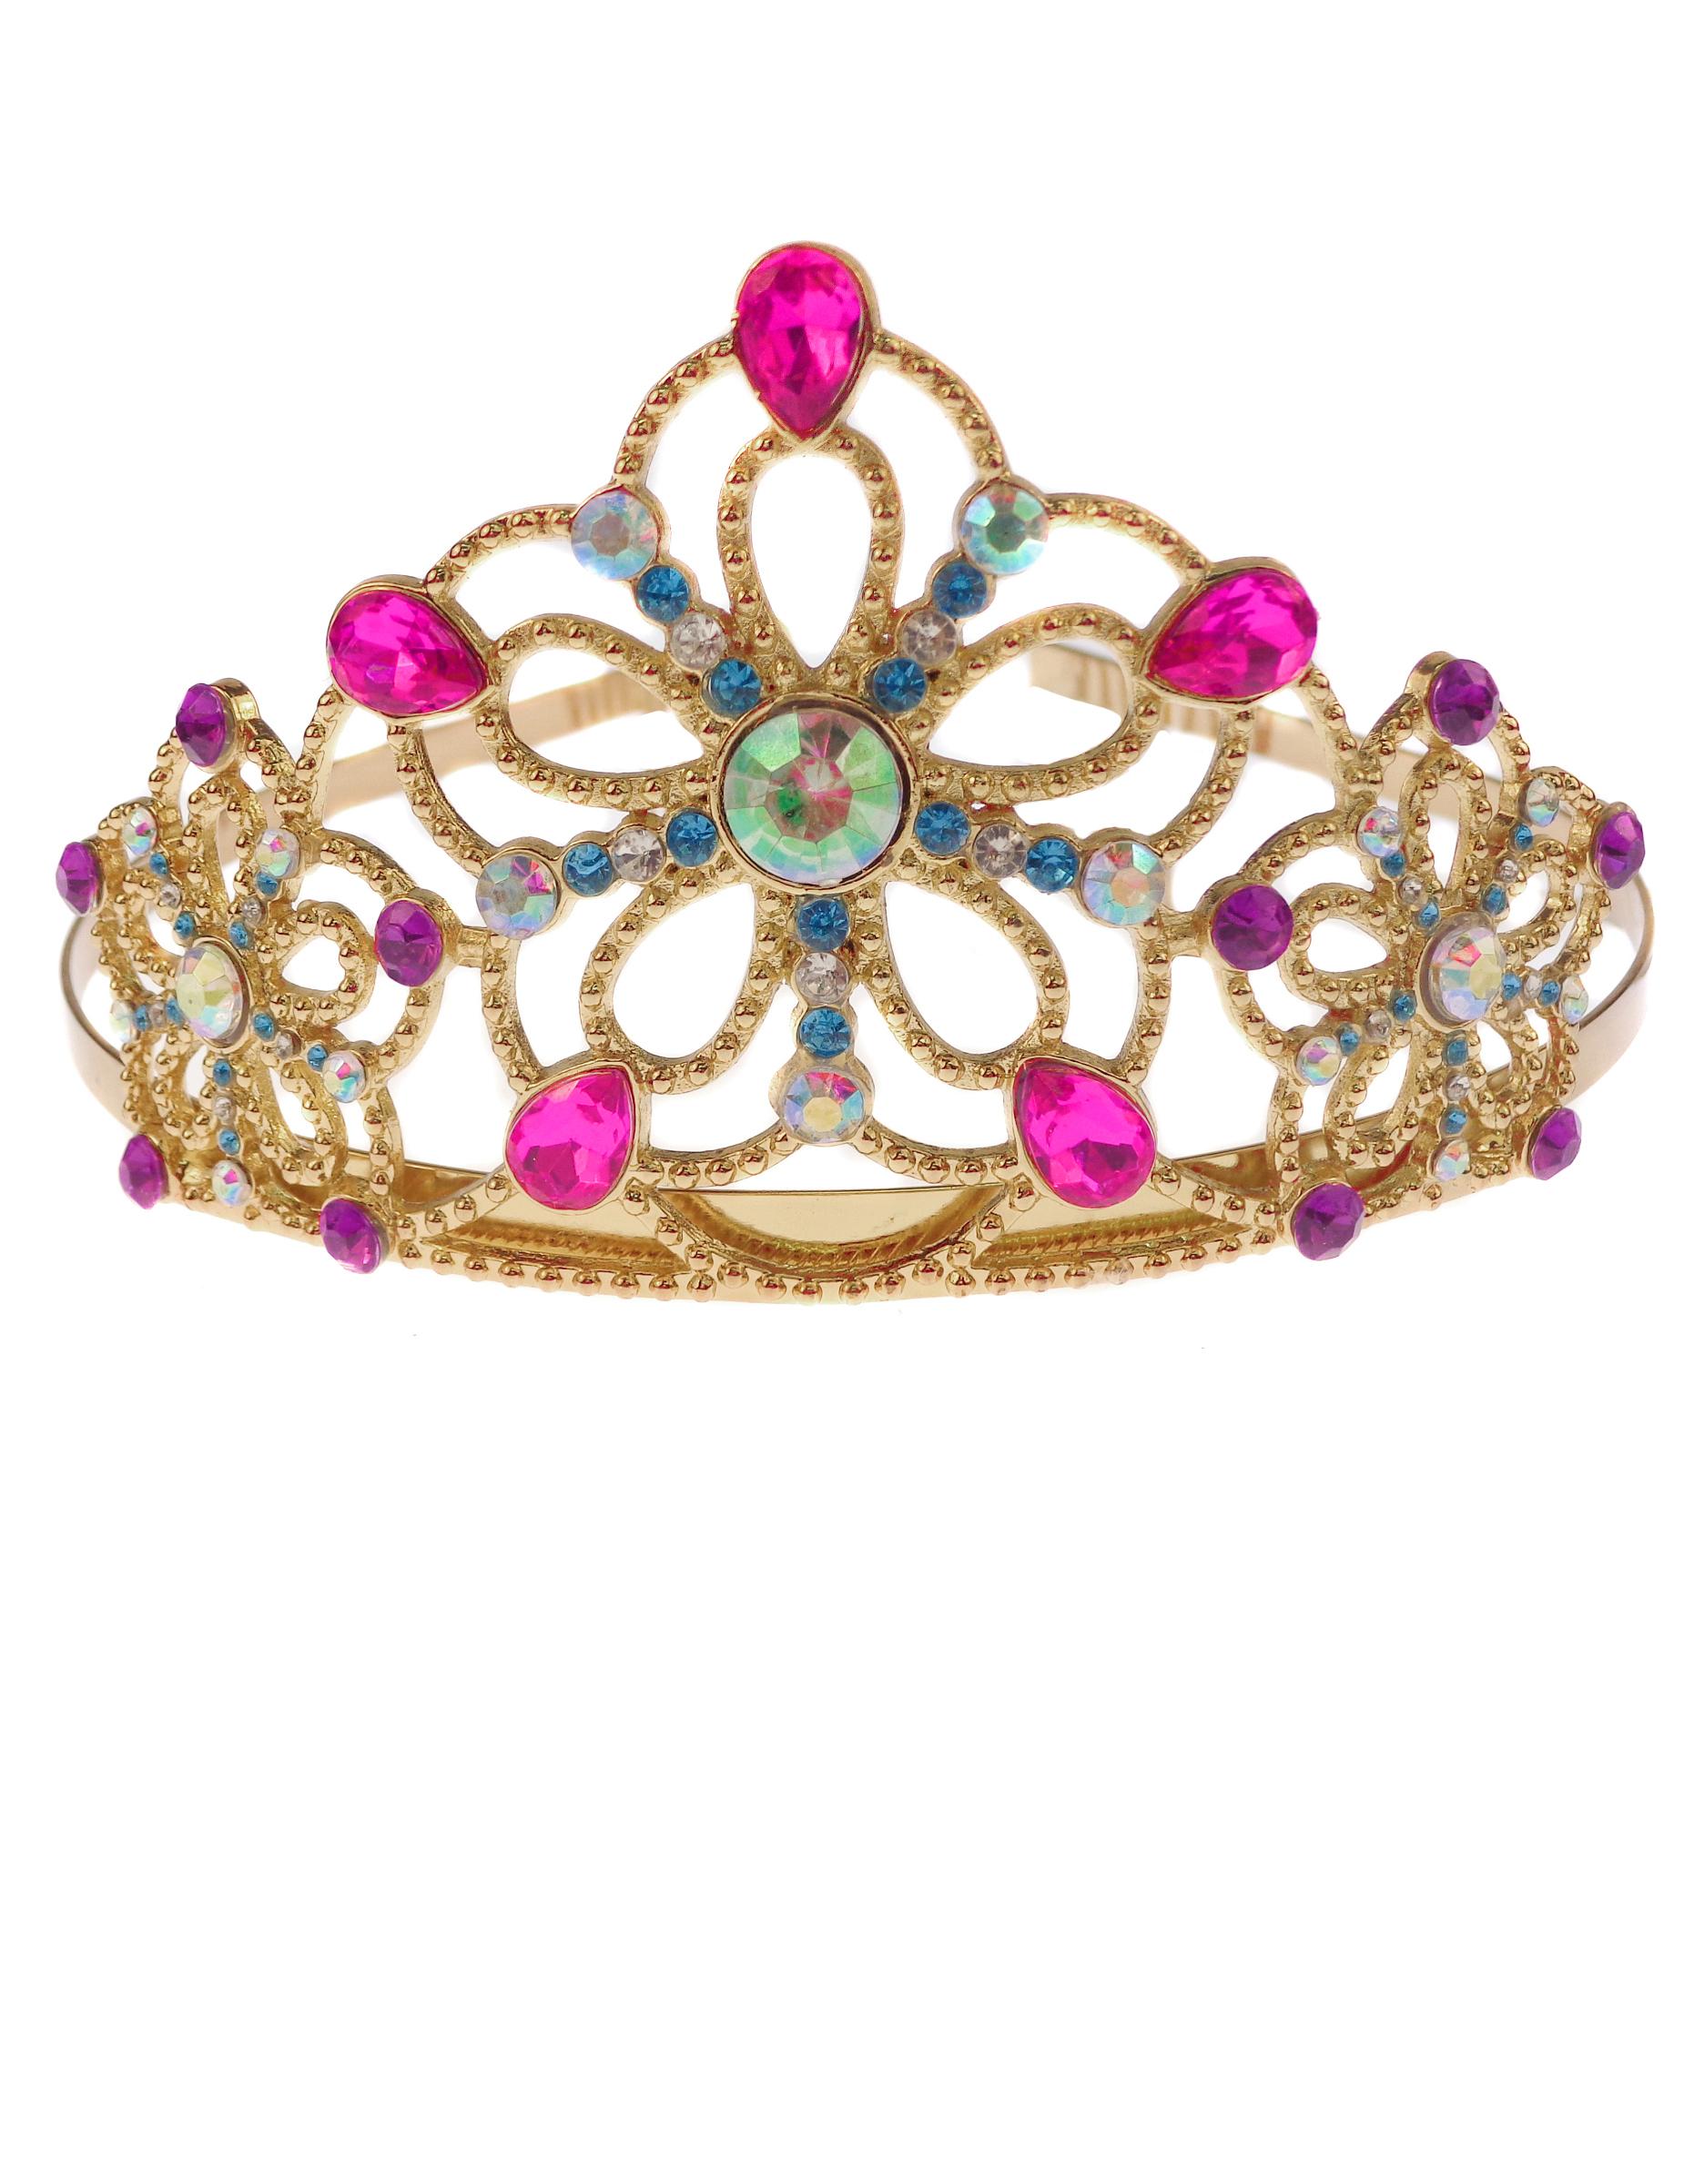 Couronne princesse dor e multicolore fille deguise toi - Couronne princesse disney ...